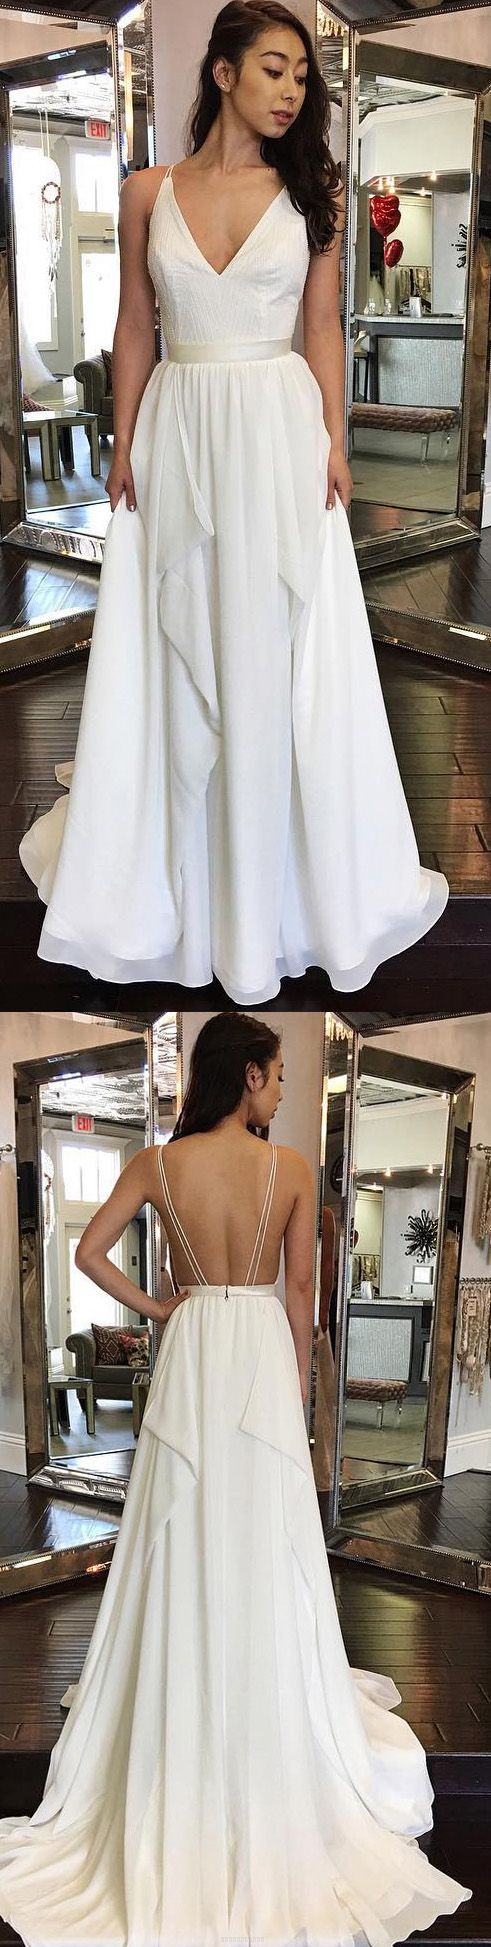 Long train wedding dresses sleeveless wedding dresses wedding